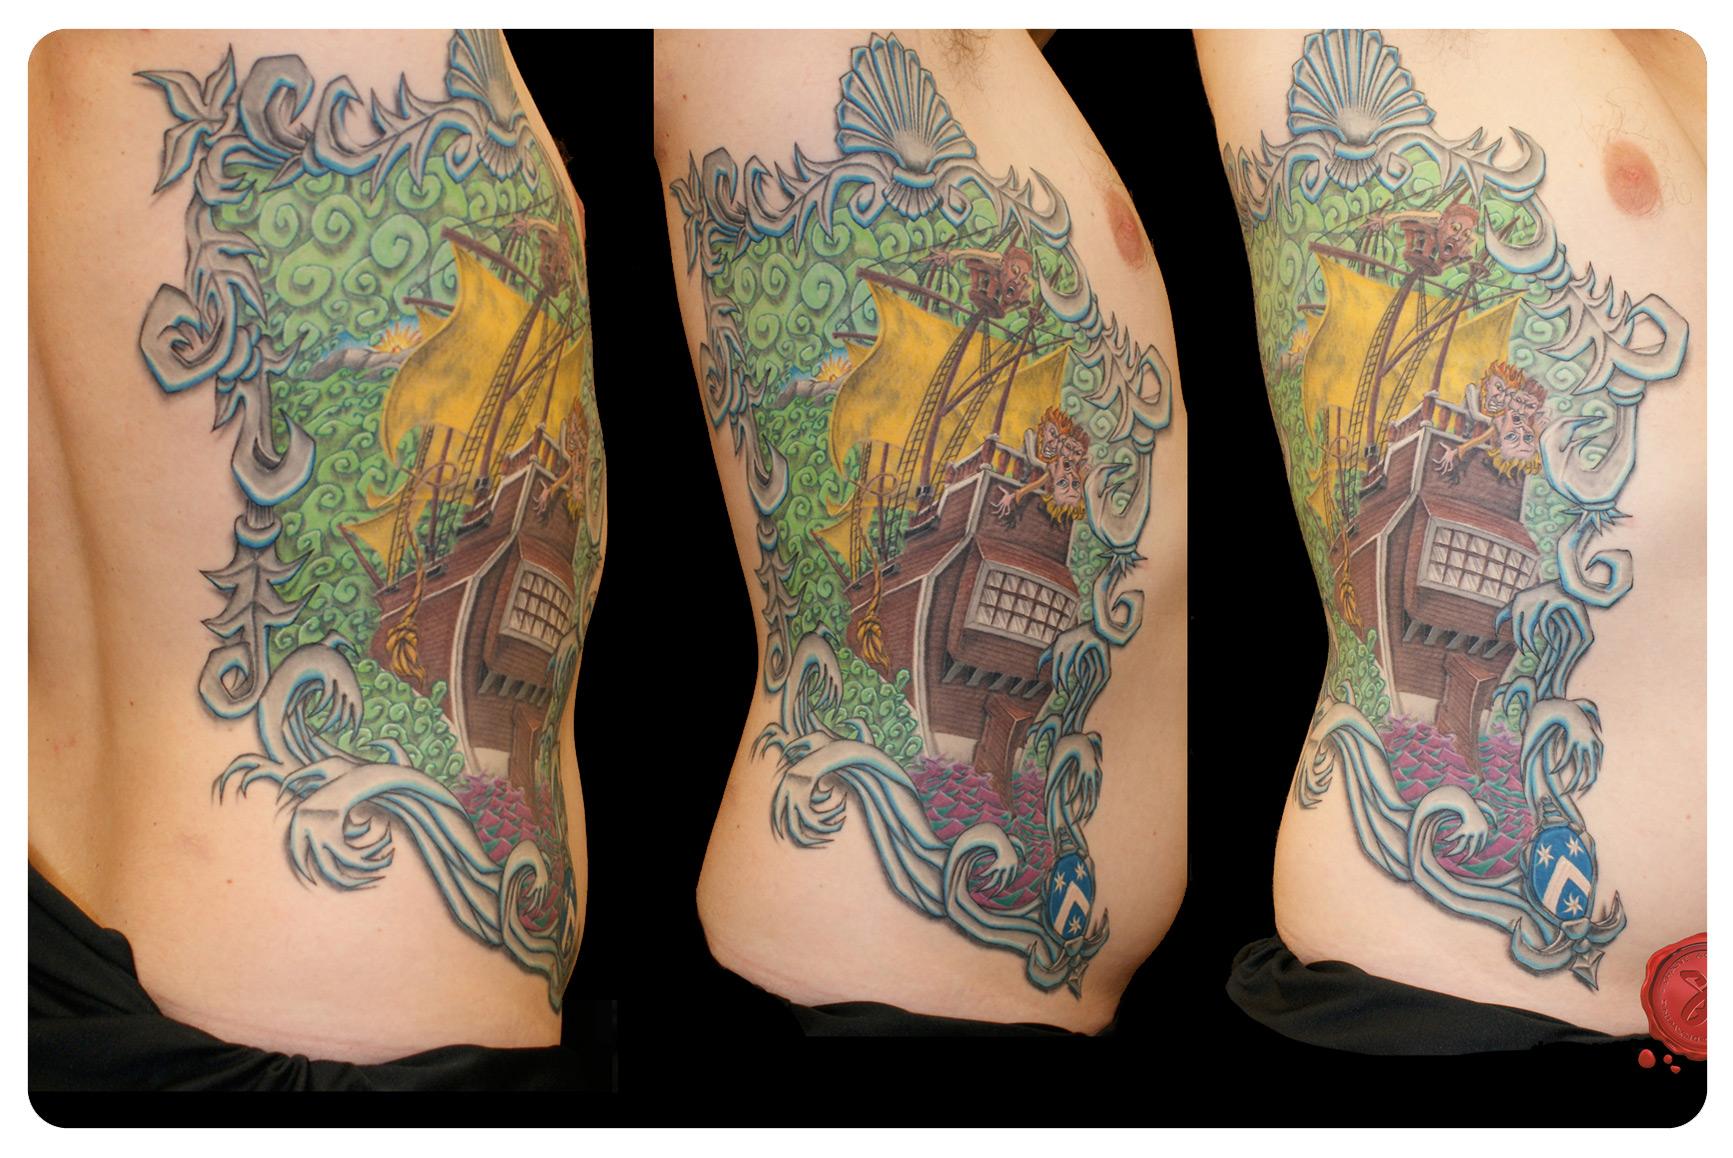 web-r_2011_tattoo_torso_abstract-realism_ship-coming-to-america.jpg